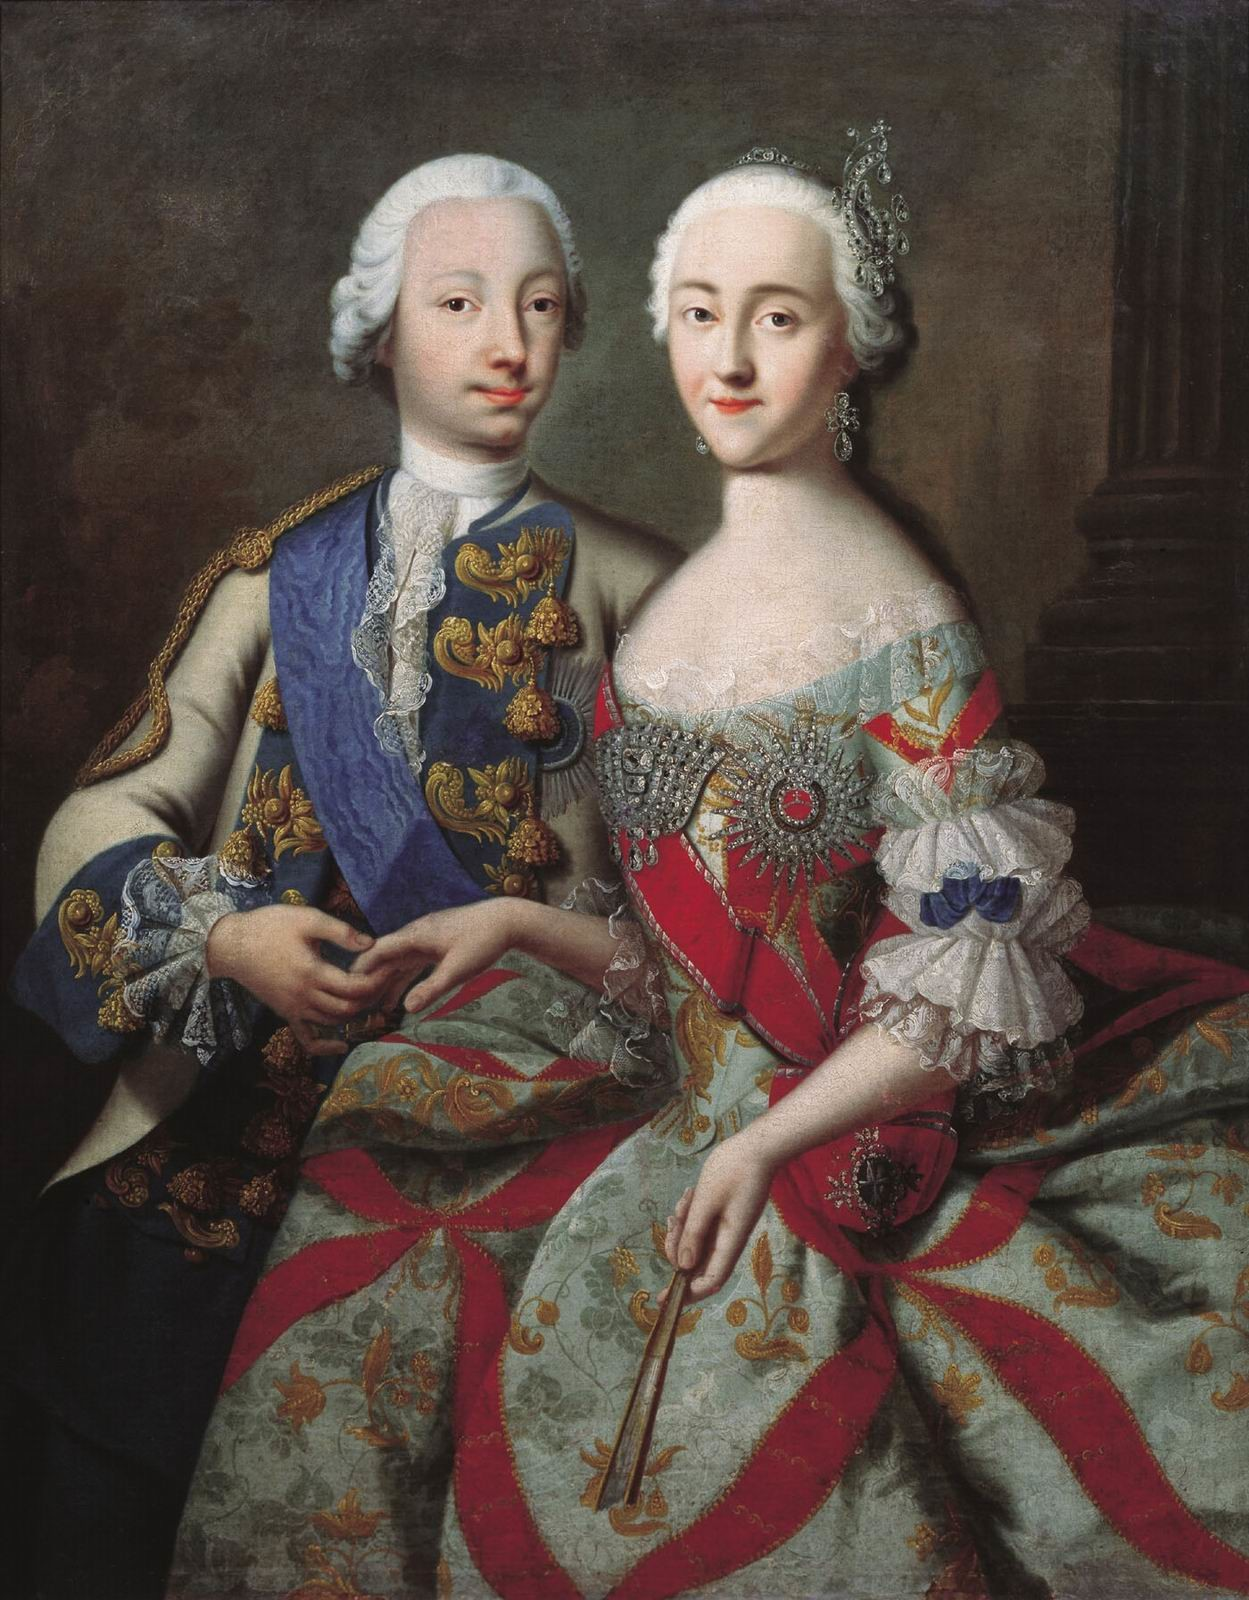 Catalina II con su marido Pedro III, obra de Georg Christoph Grooth (c. 1745).